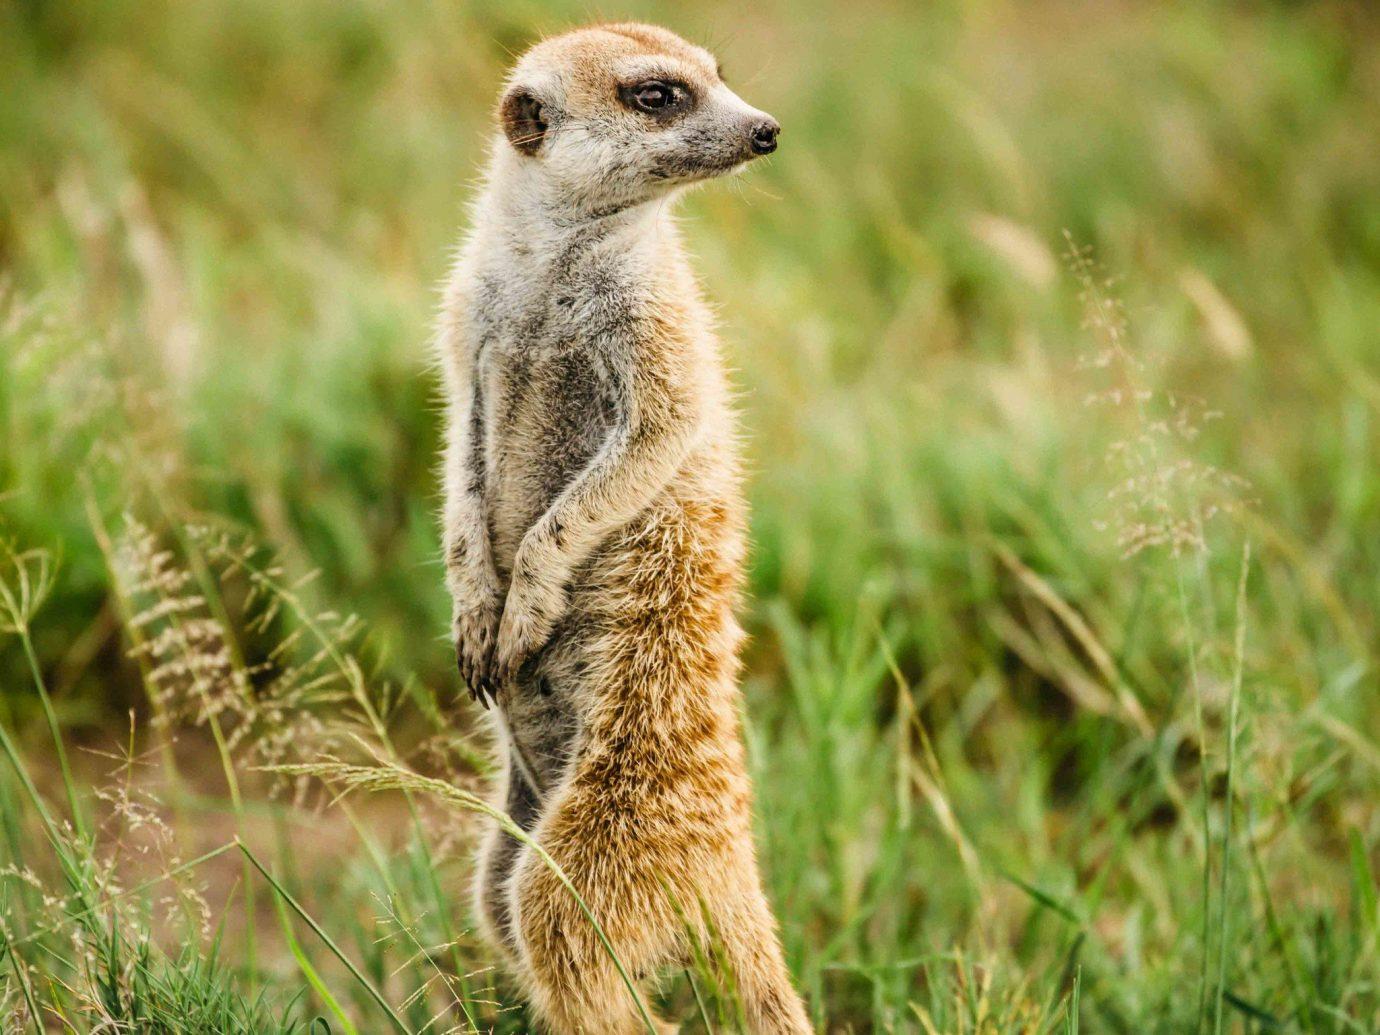 Outdoor Activities Safari Trip Ideas grass outdoor animal meerkat mammal ecosystem Wildlife fauna standing terrestrial animal grassland ecoregion prairie organism mongoose whiskers snout savanna